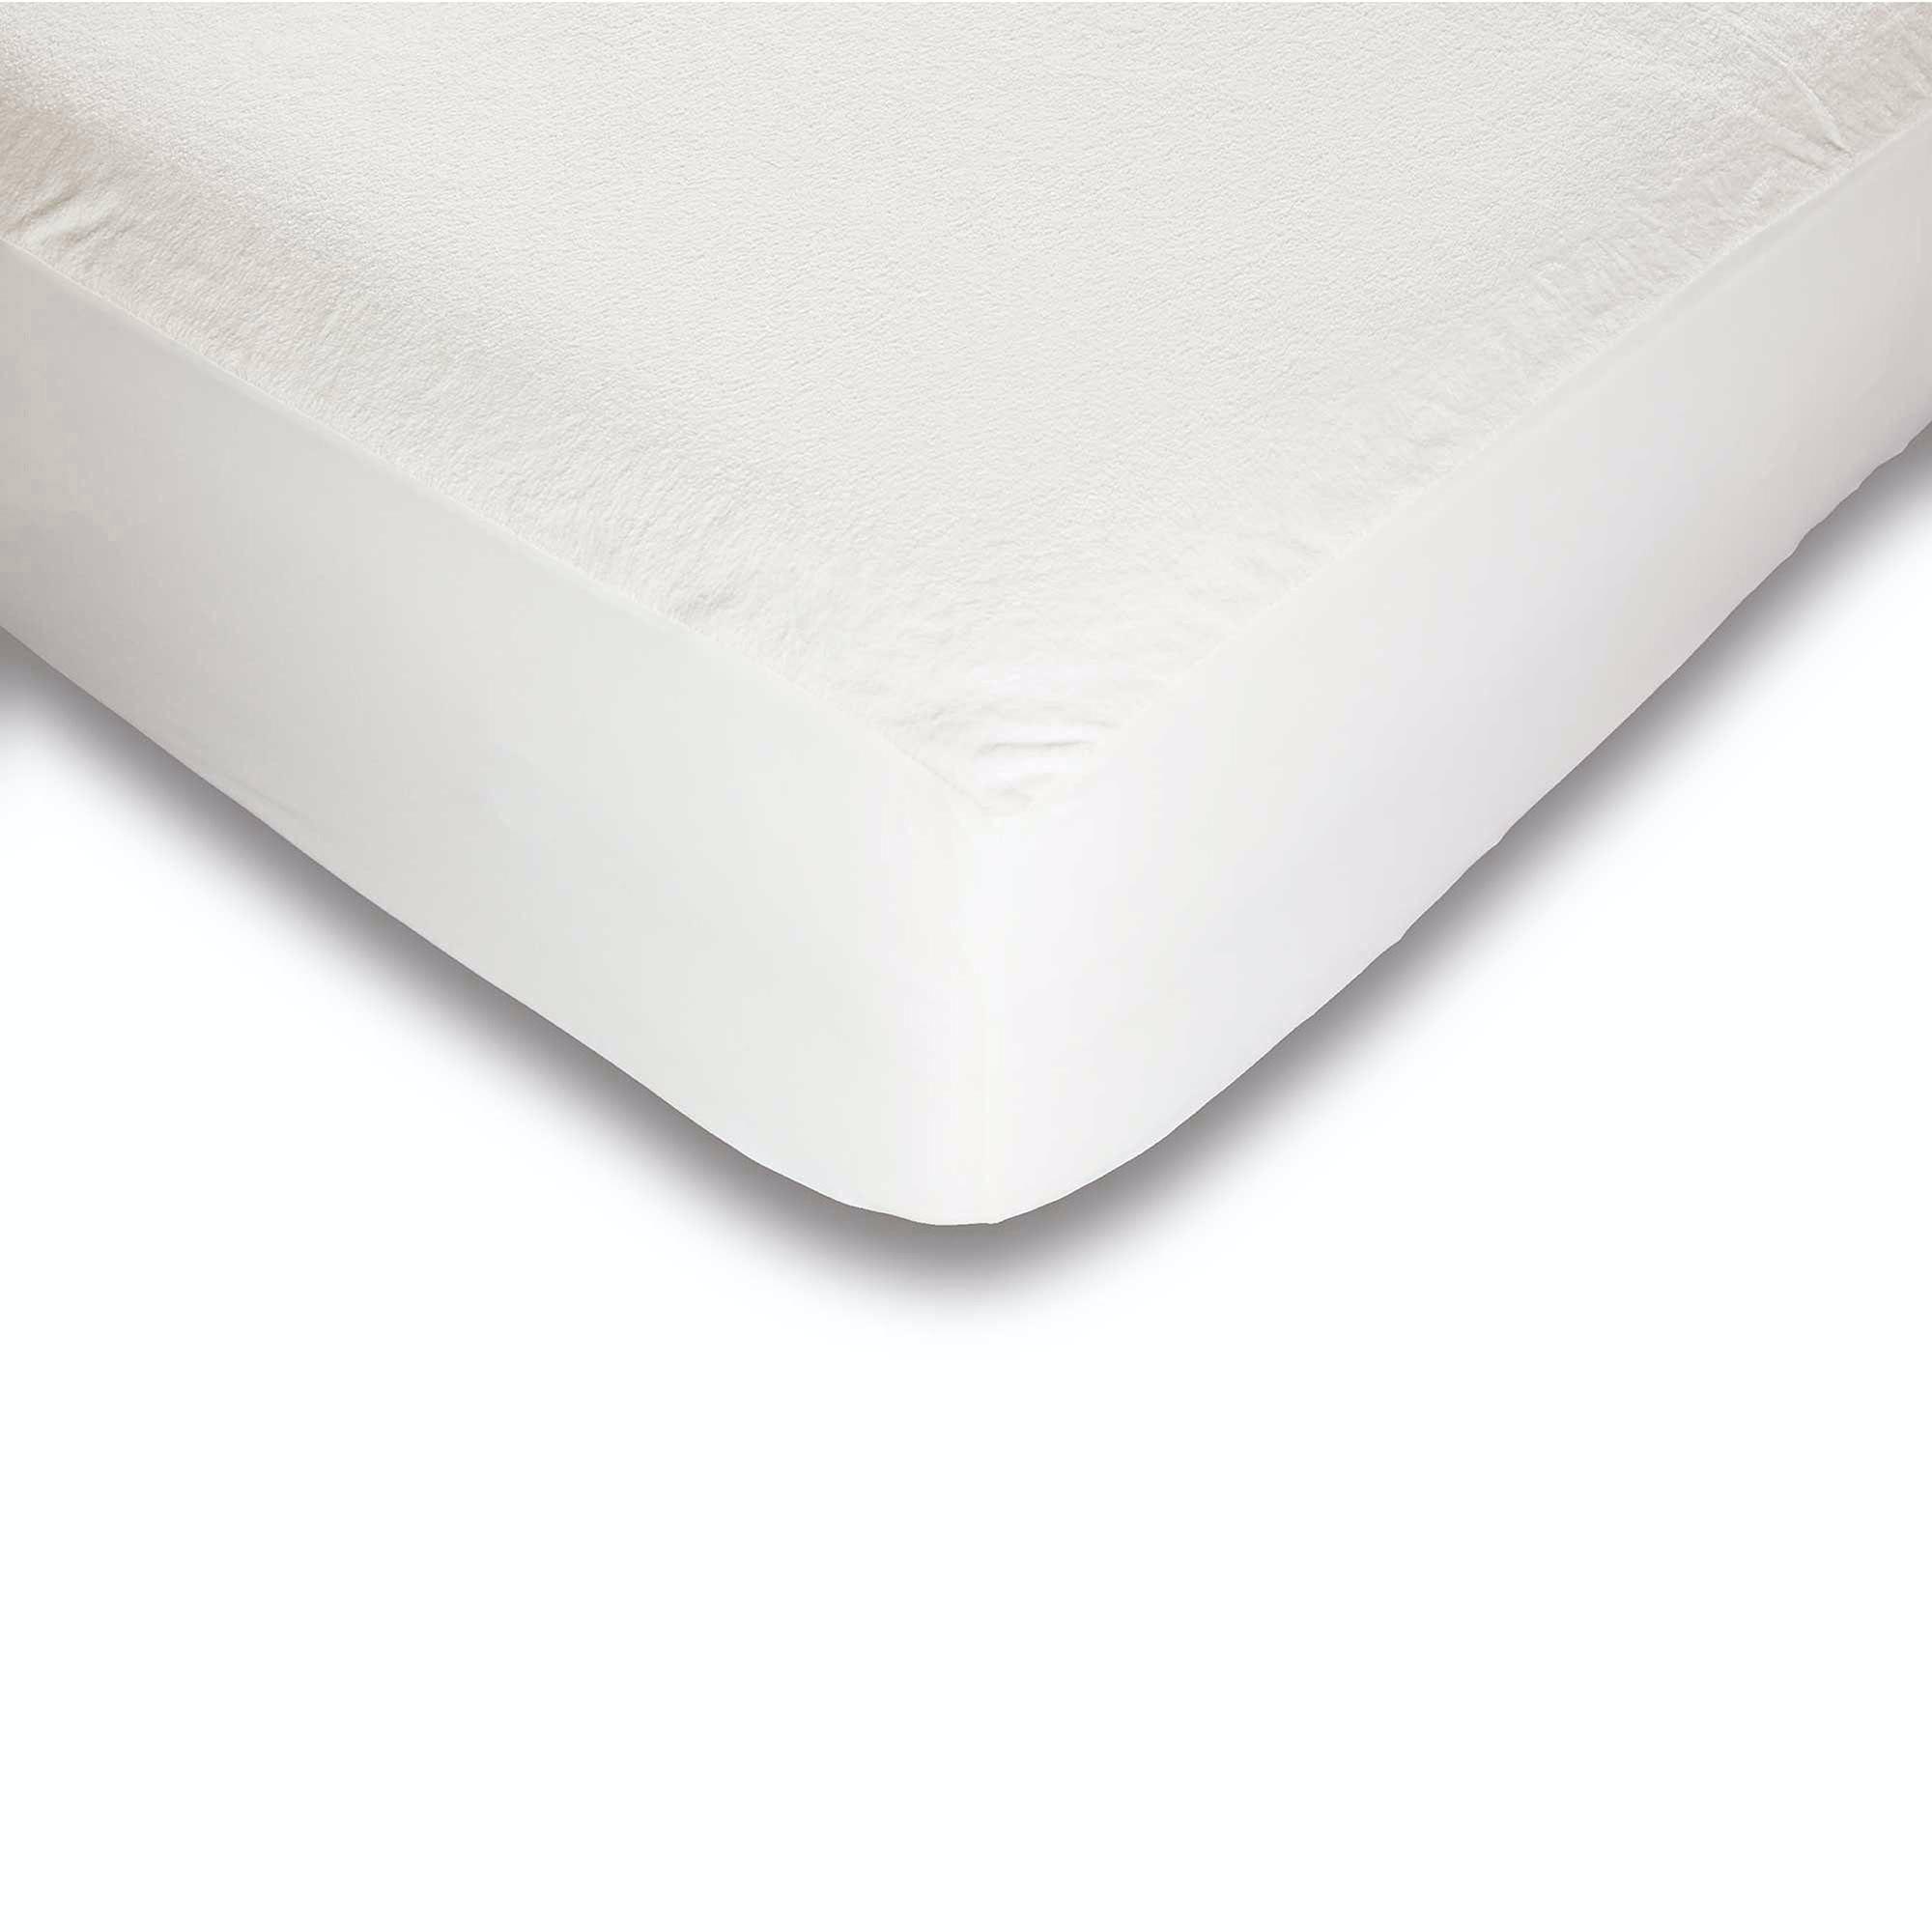 Leggett /& Platt Sleep Plush Mattress Protector Bed Sheet with Ultra-Soft and Waterproof Fabric King Leggett /& Platt Home Textiles QD0448